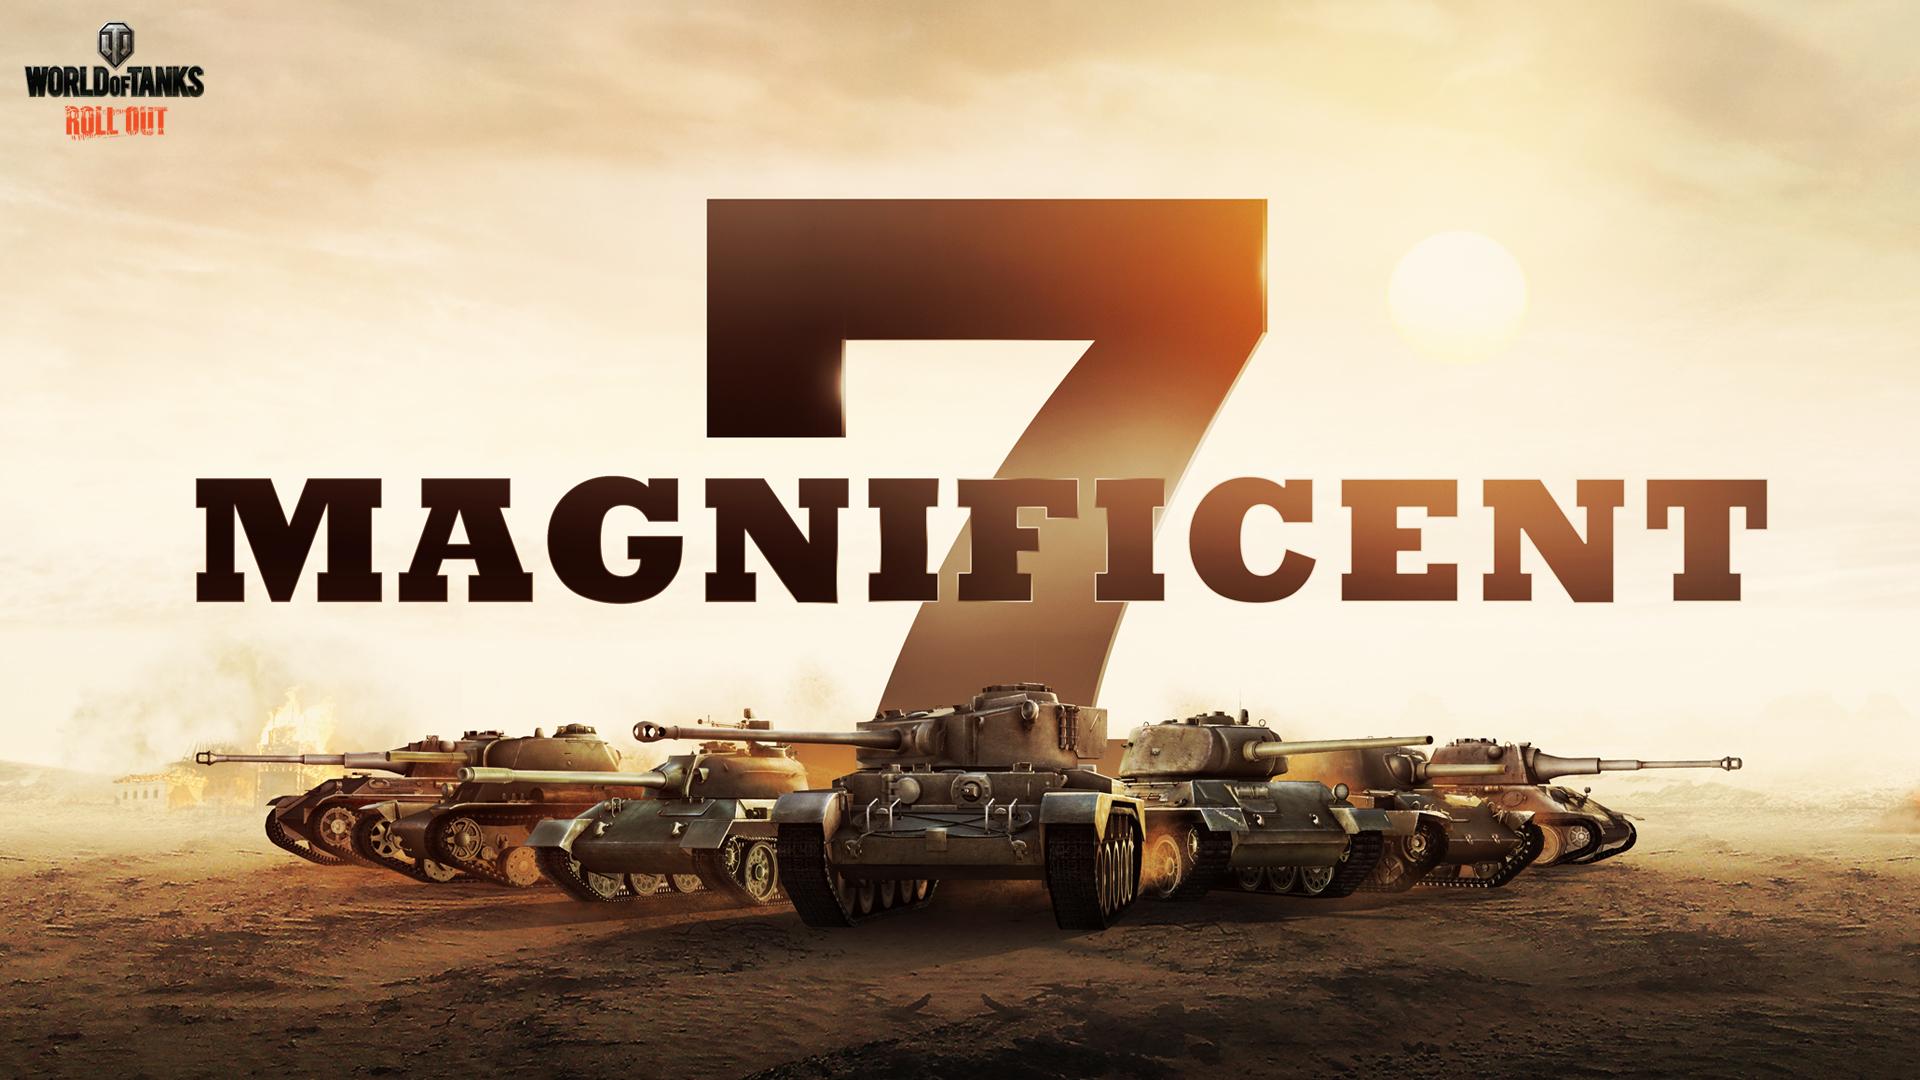 wot_mag7_wp_1920x1080.jpg - World of Tanks